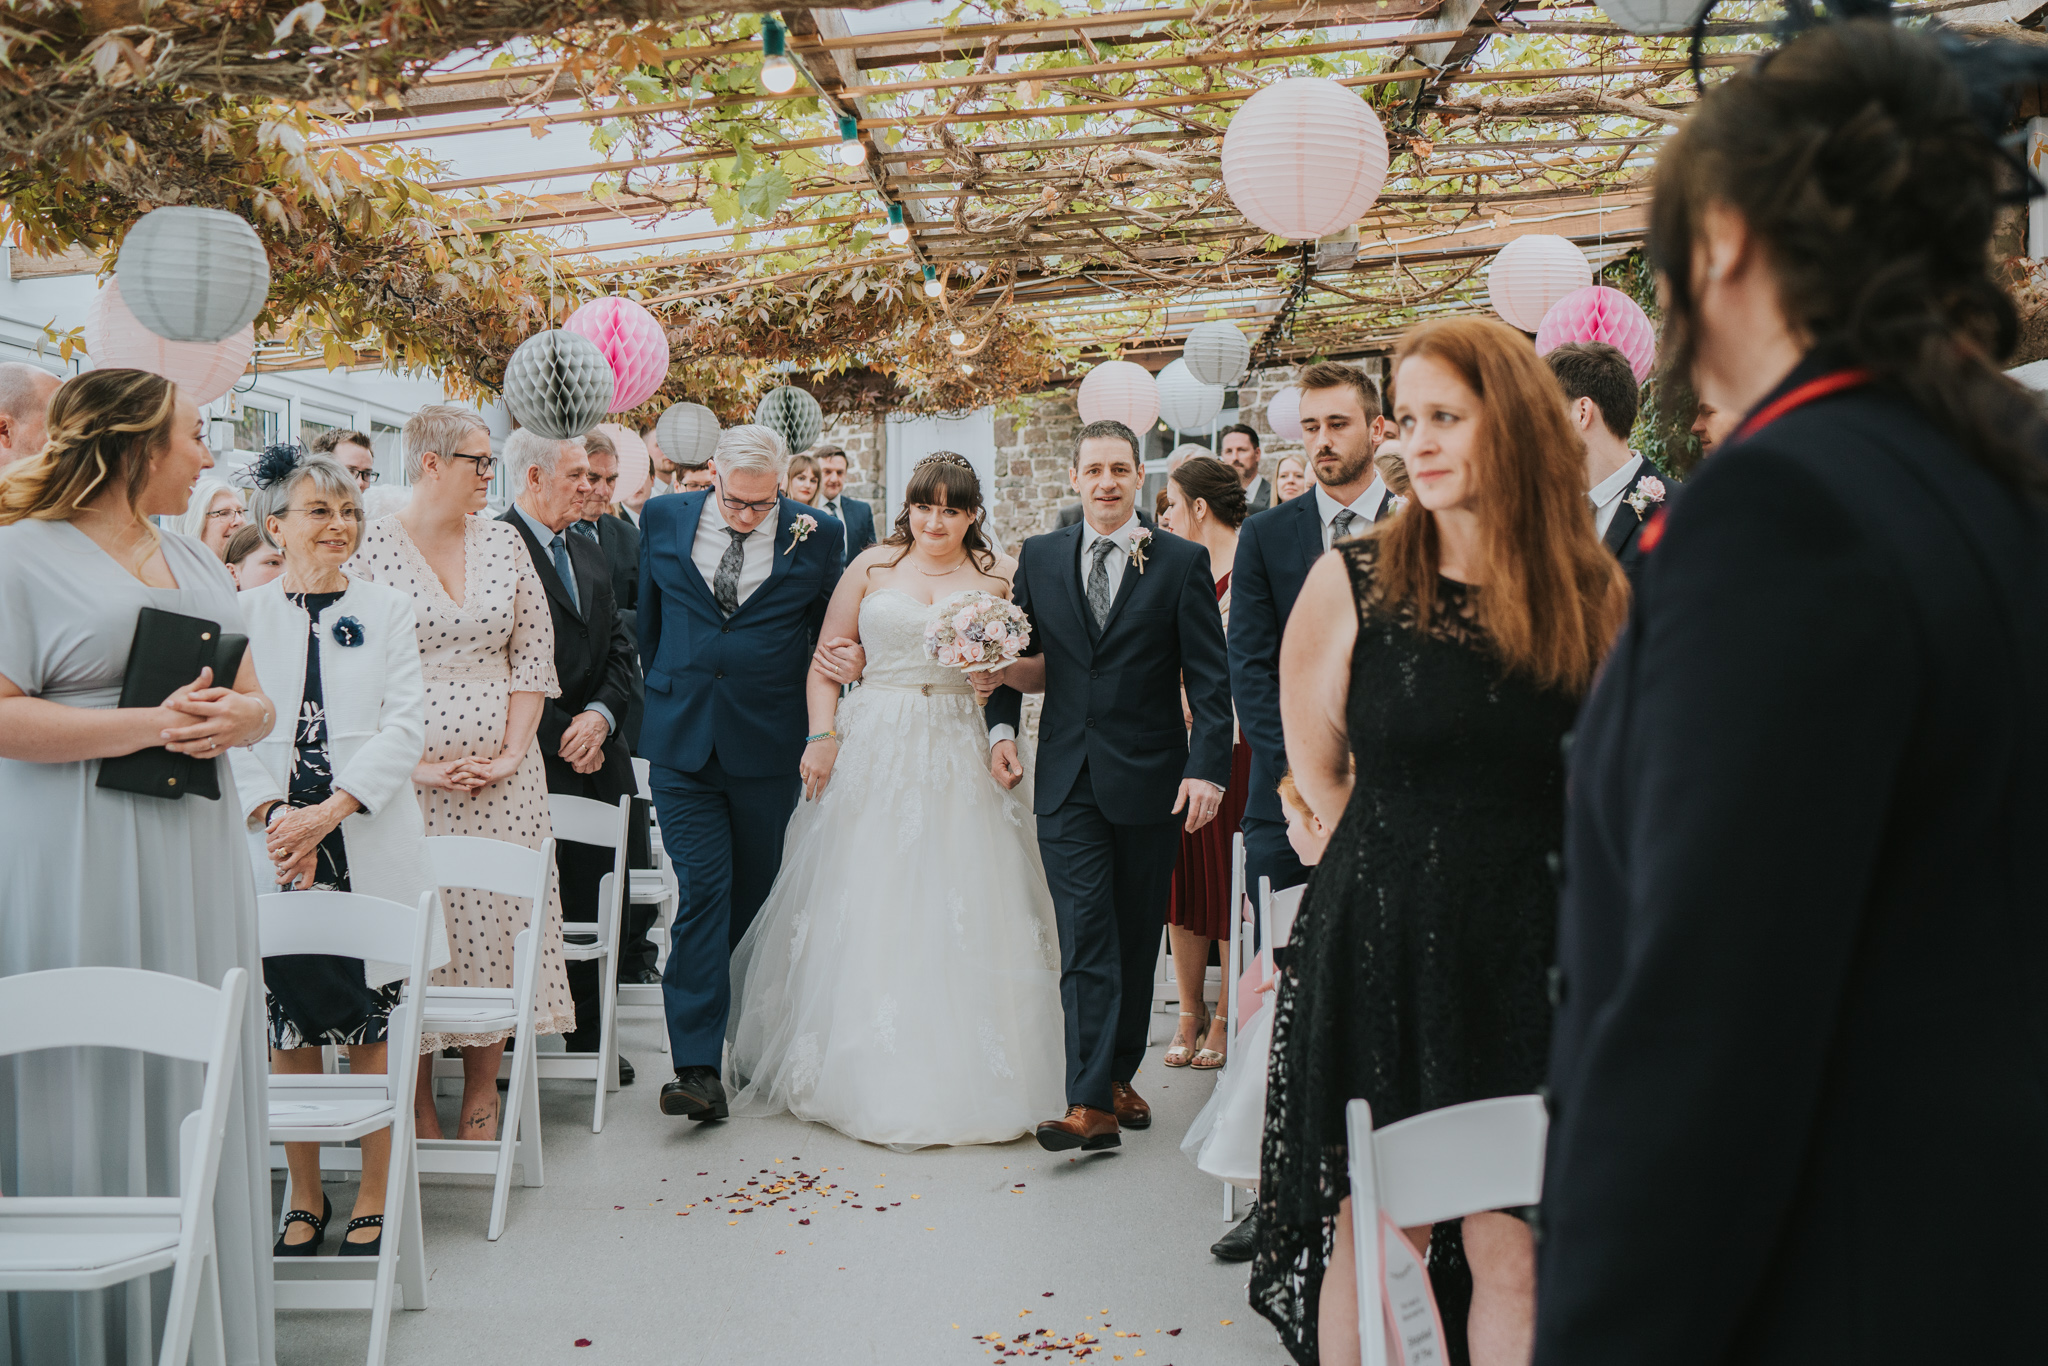 grace-sam-old-barn-clovelly-devon-wedding-photographer-grace-elizabeth-essex-suffolk-norfolk-wedding-photographer (43 of 132).jpg